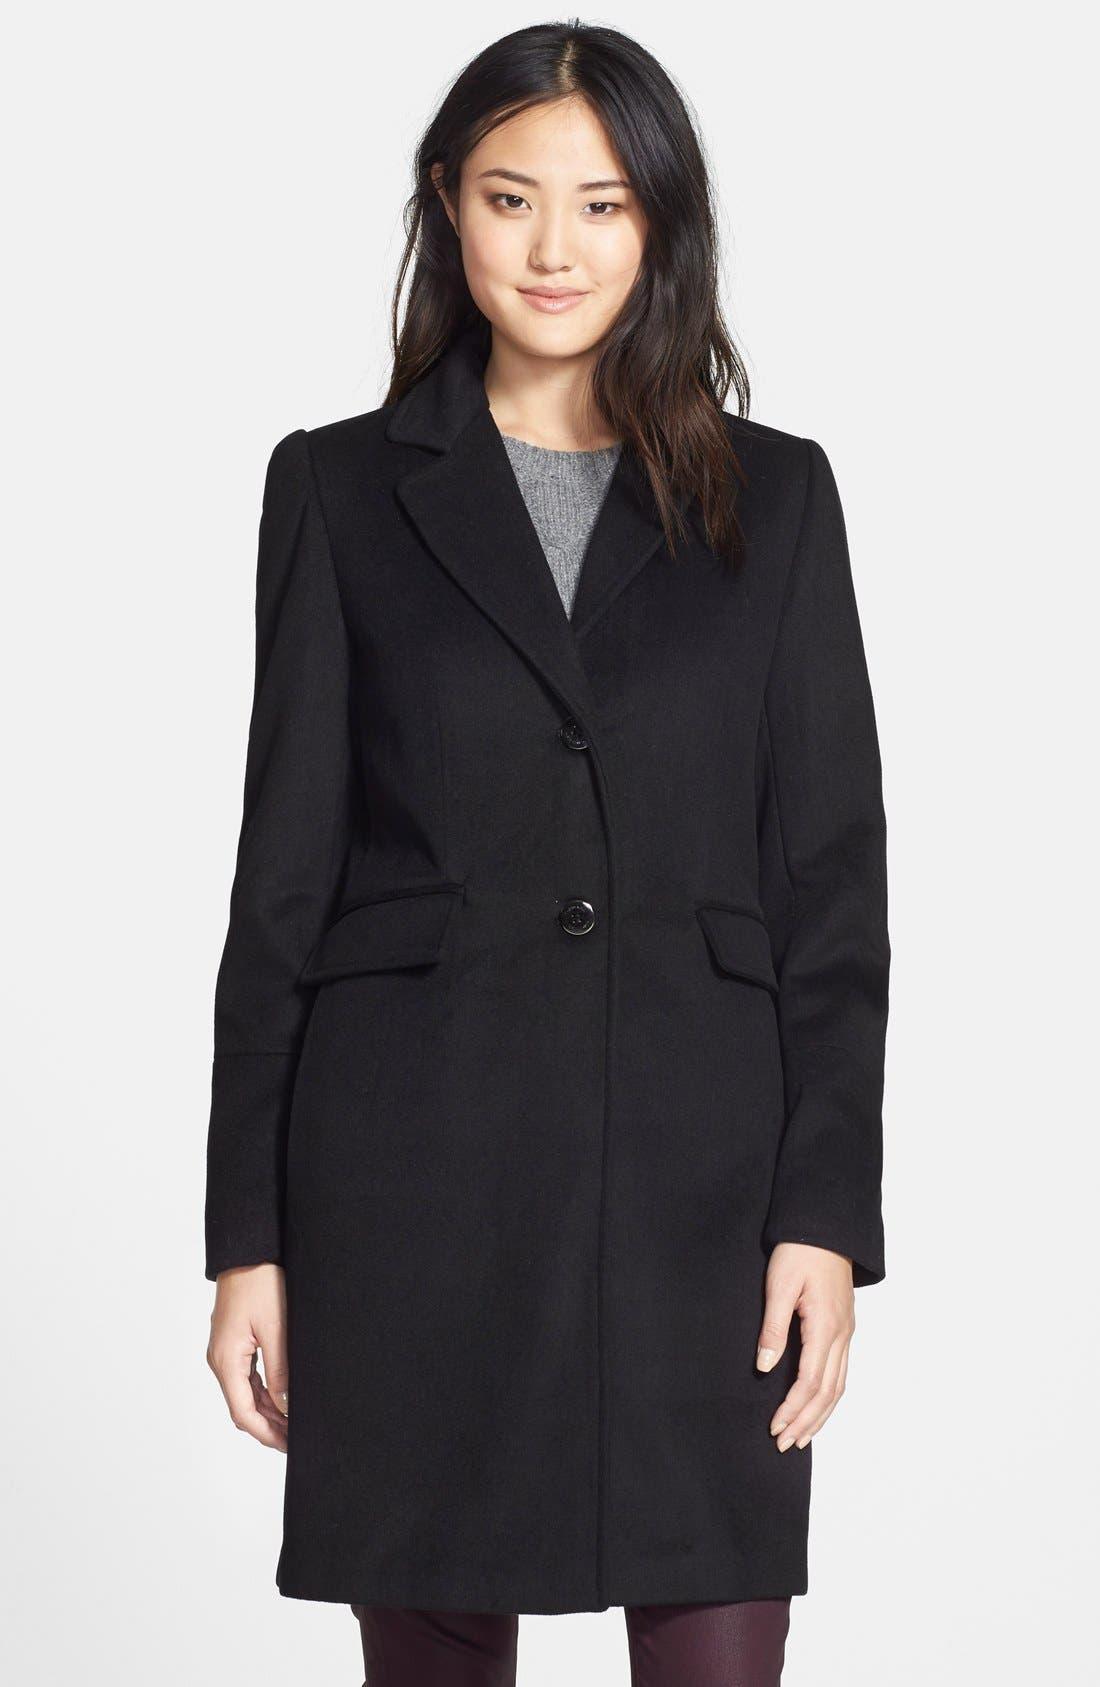 CALVIN KLEIN,                             Notch Collar Wool Blend Coat,                             Main thumbnail 1, color,                             001